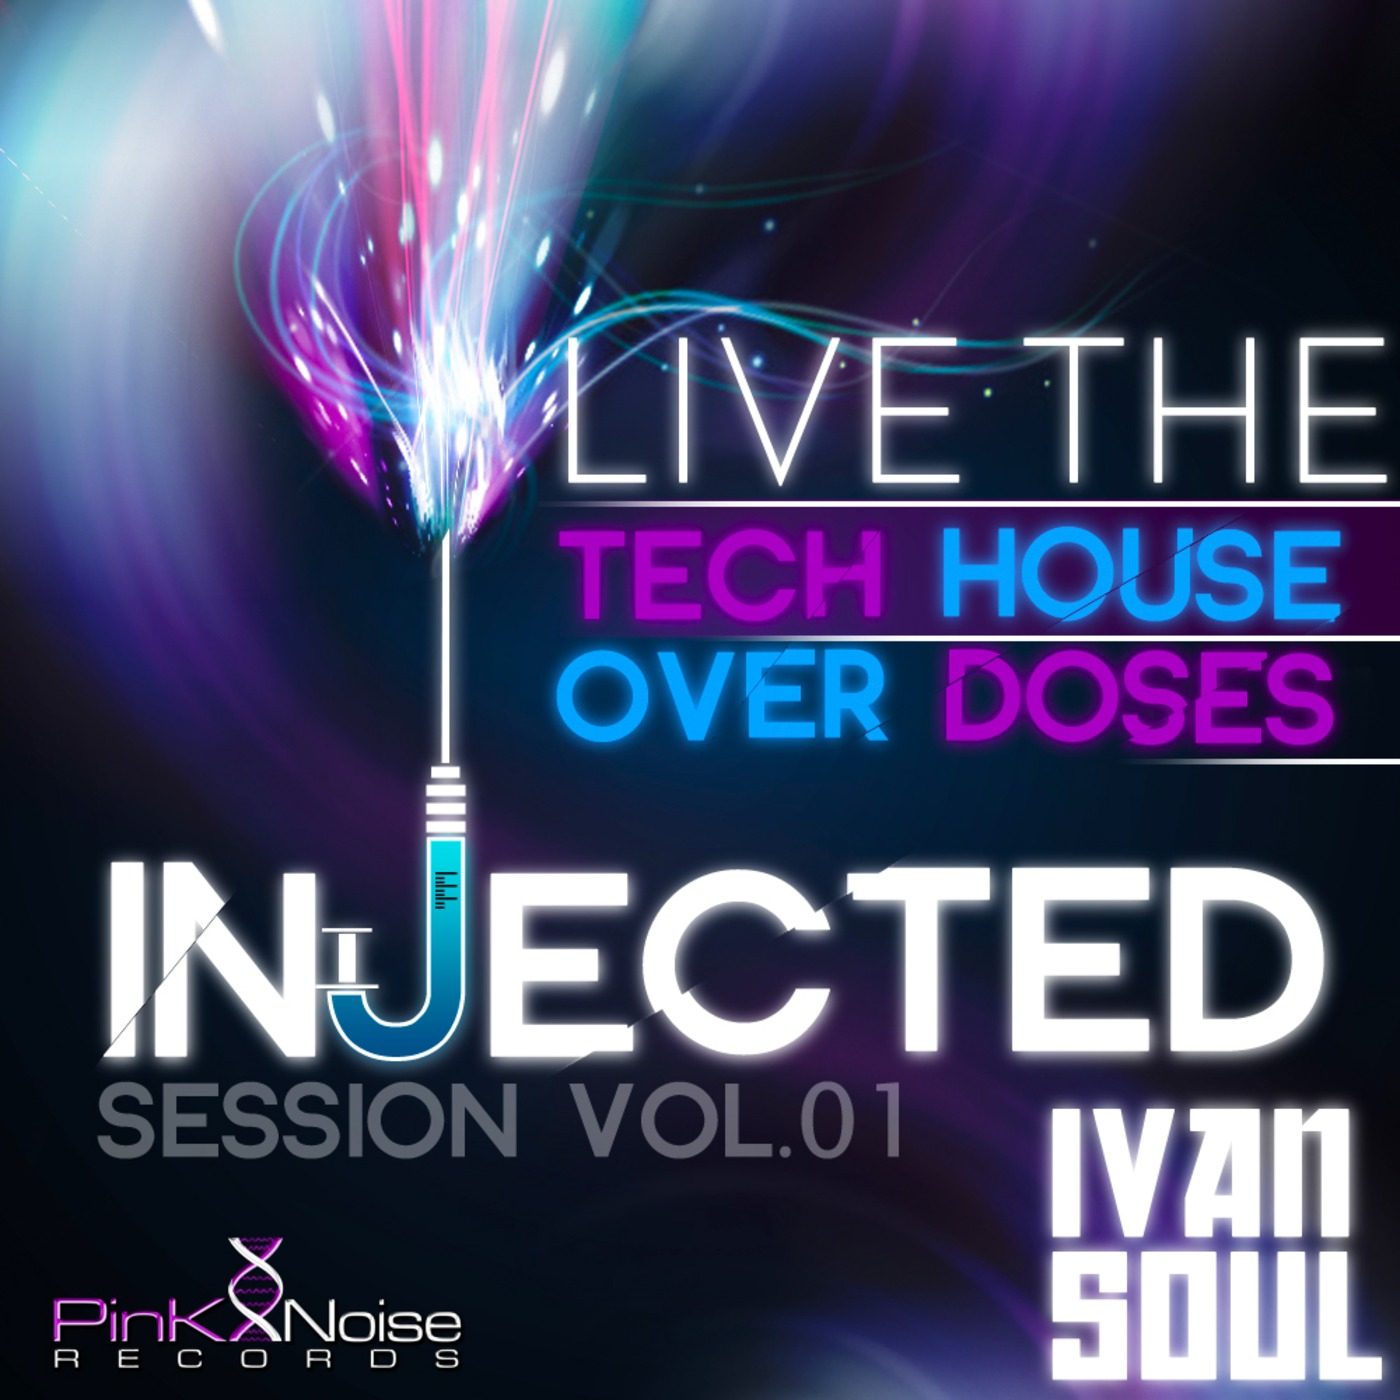 Ivan Soul - Injected Session (Episode 1)